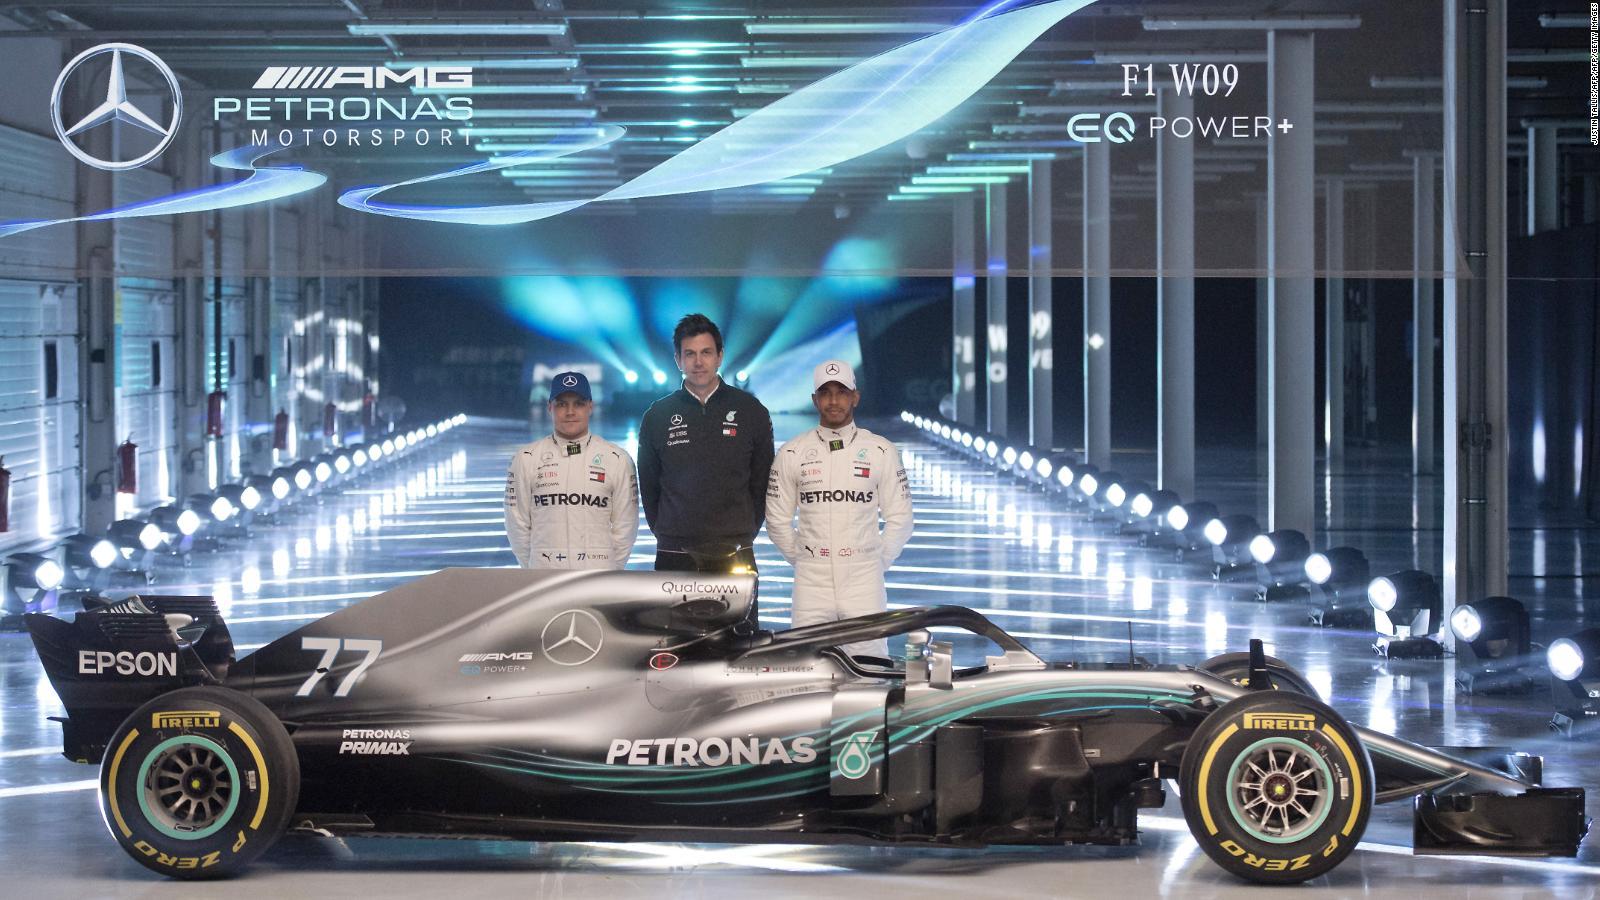 Mercedes boss Toto Wolff on the 2018 F1 season